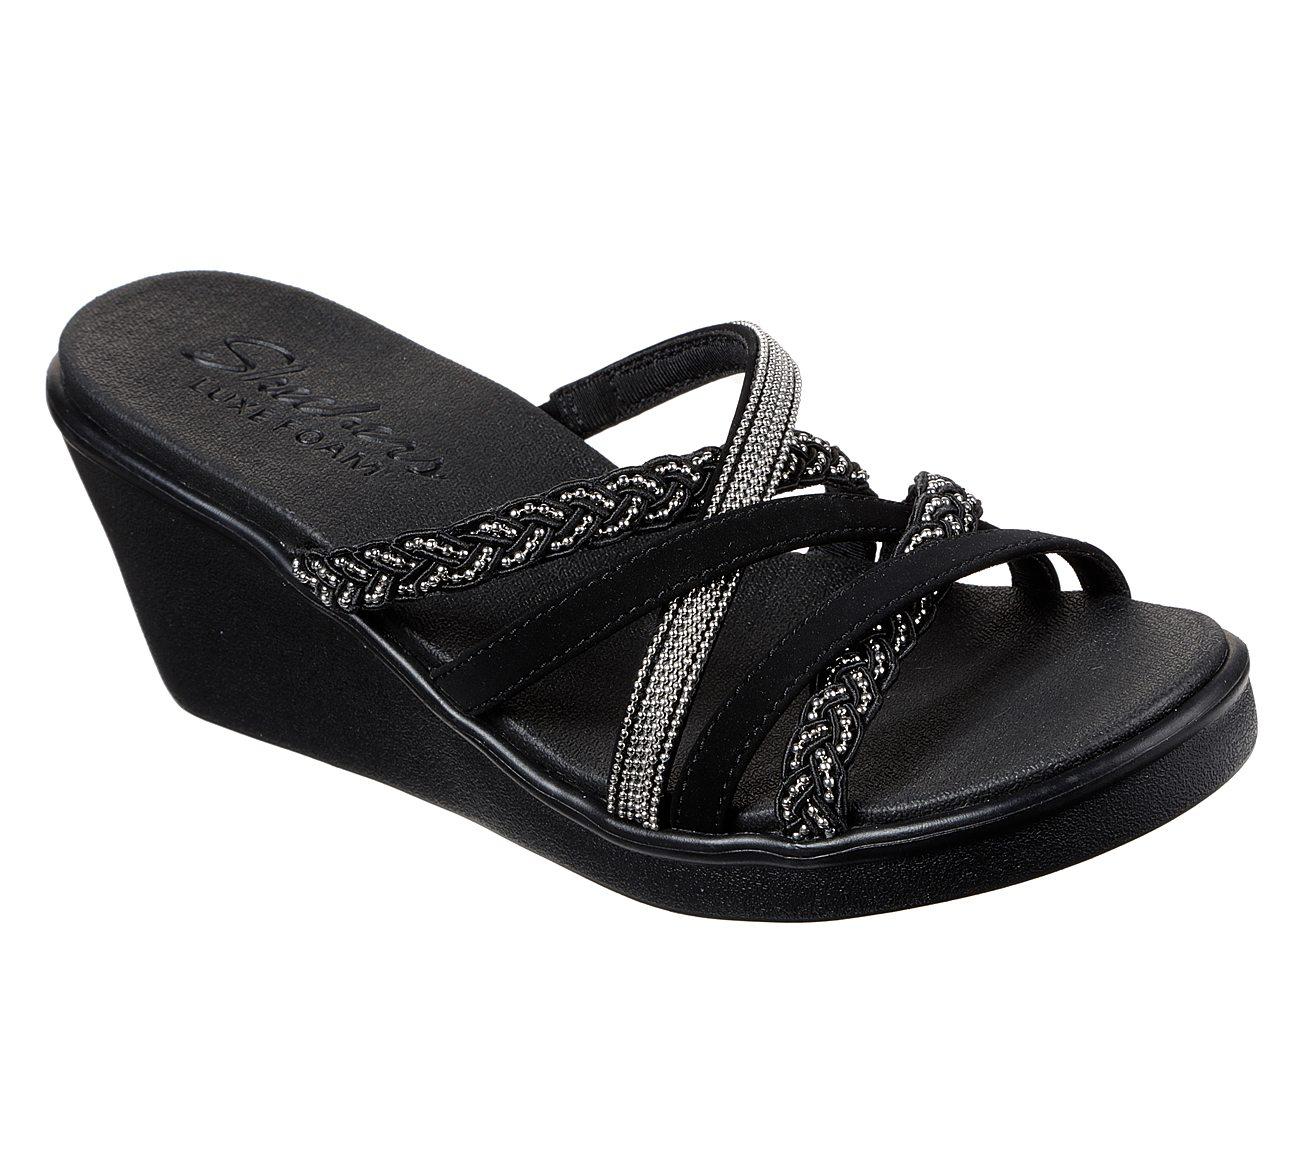 visitante apasionado ganancia  Buy SKECHERS Rumble On - Dreamy Days SKECHERS Cali Shoes